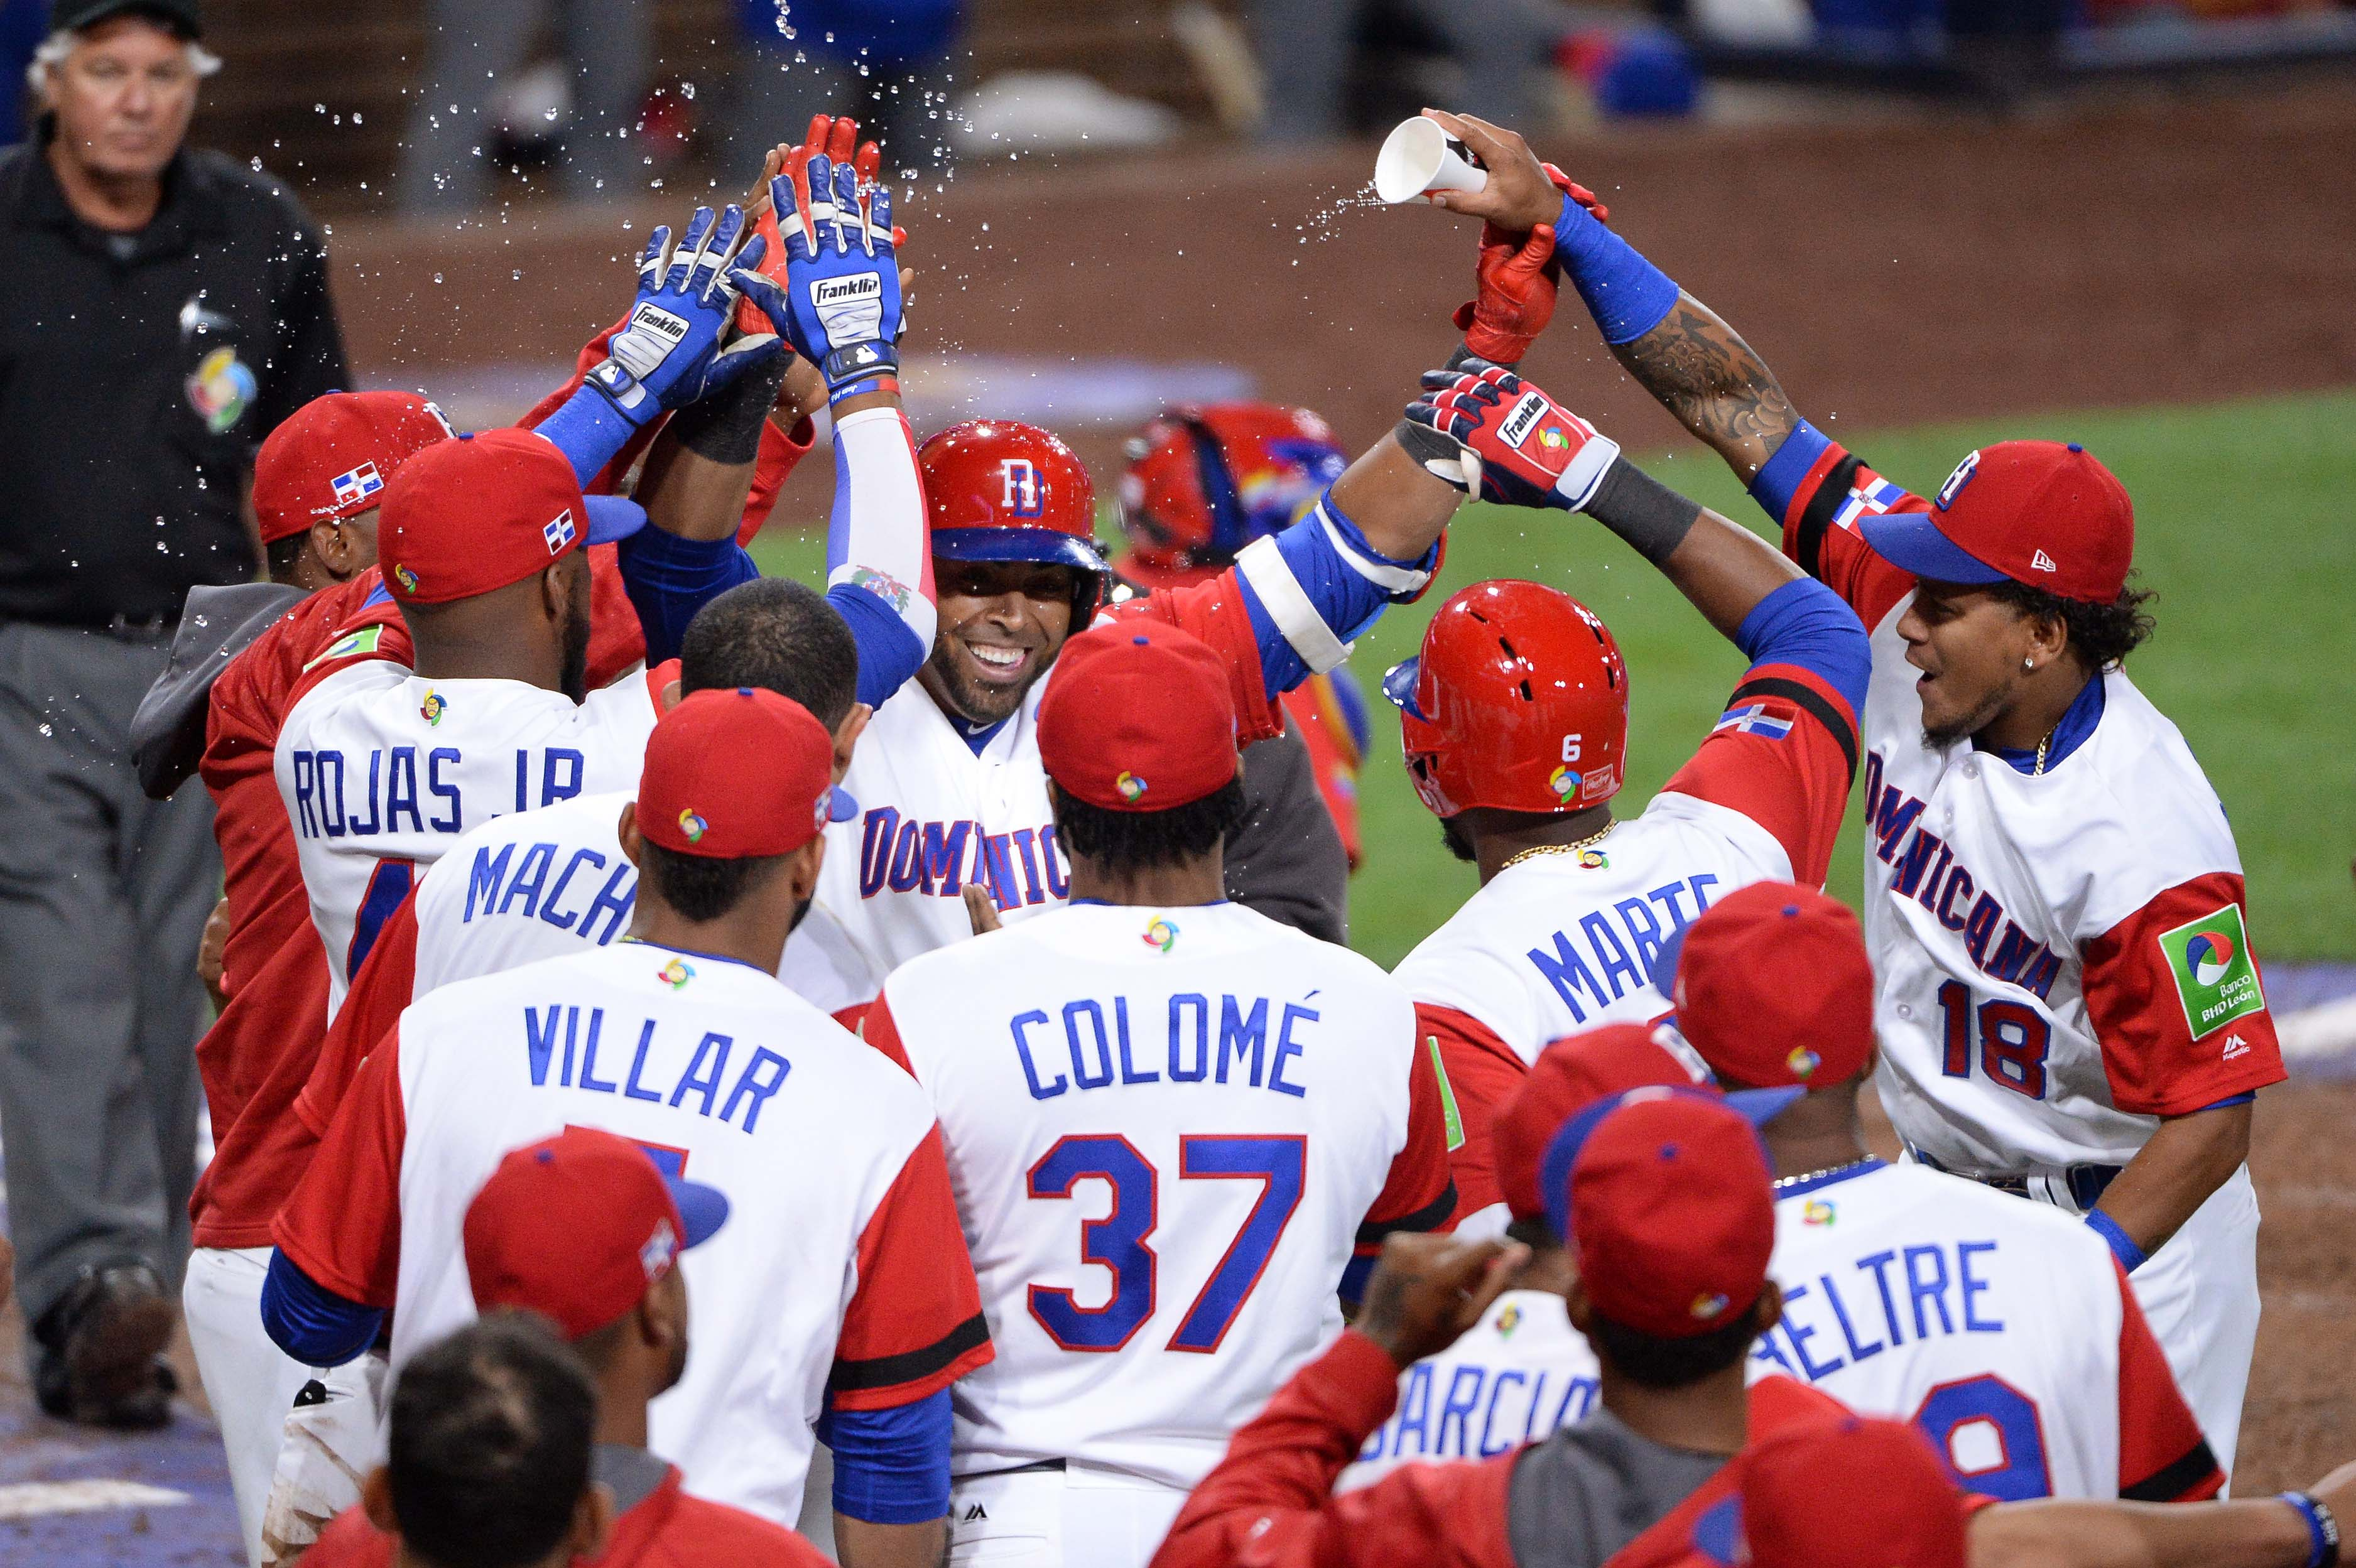 9949268-baseball-world-baseball-classic-venezuela-at-dominican-republic